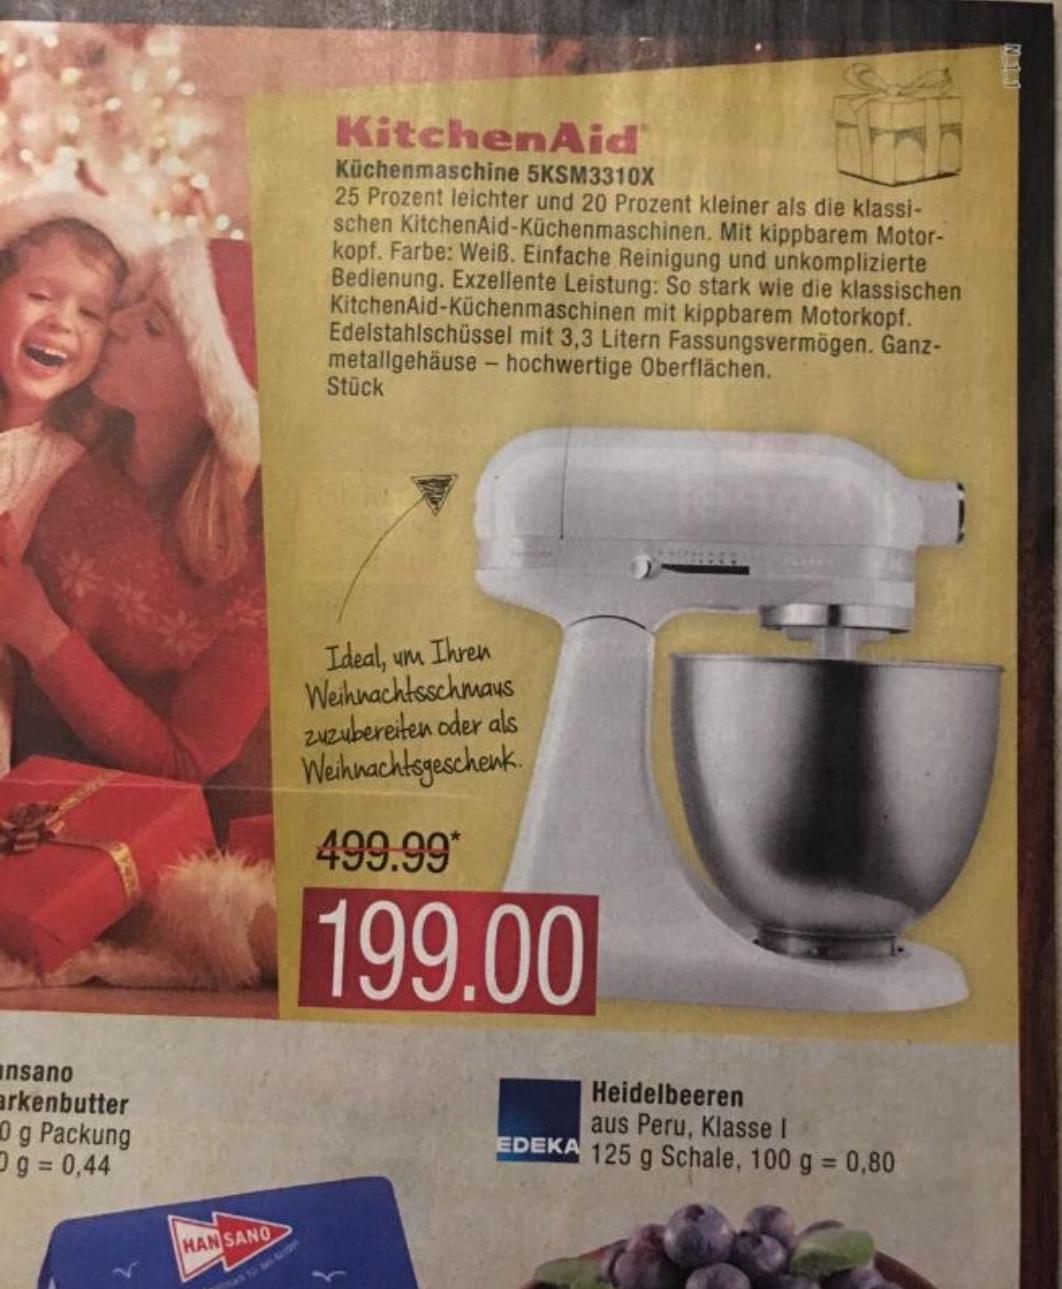 (Marktkauf) (Lokal Hamburg und Buxtehude) KitchenAid 5KSM3310X